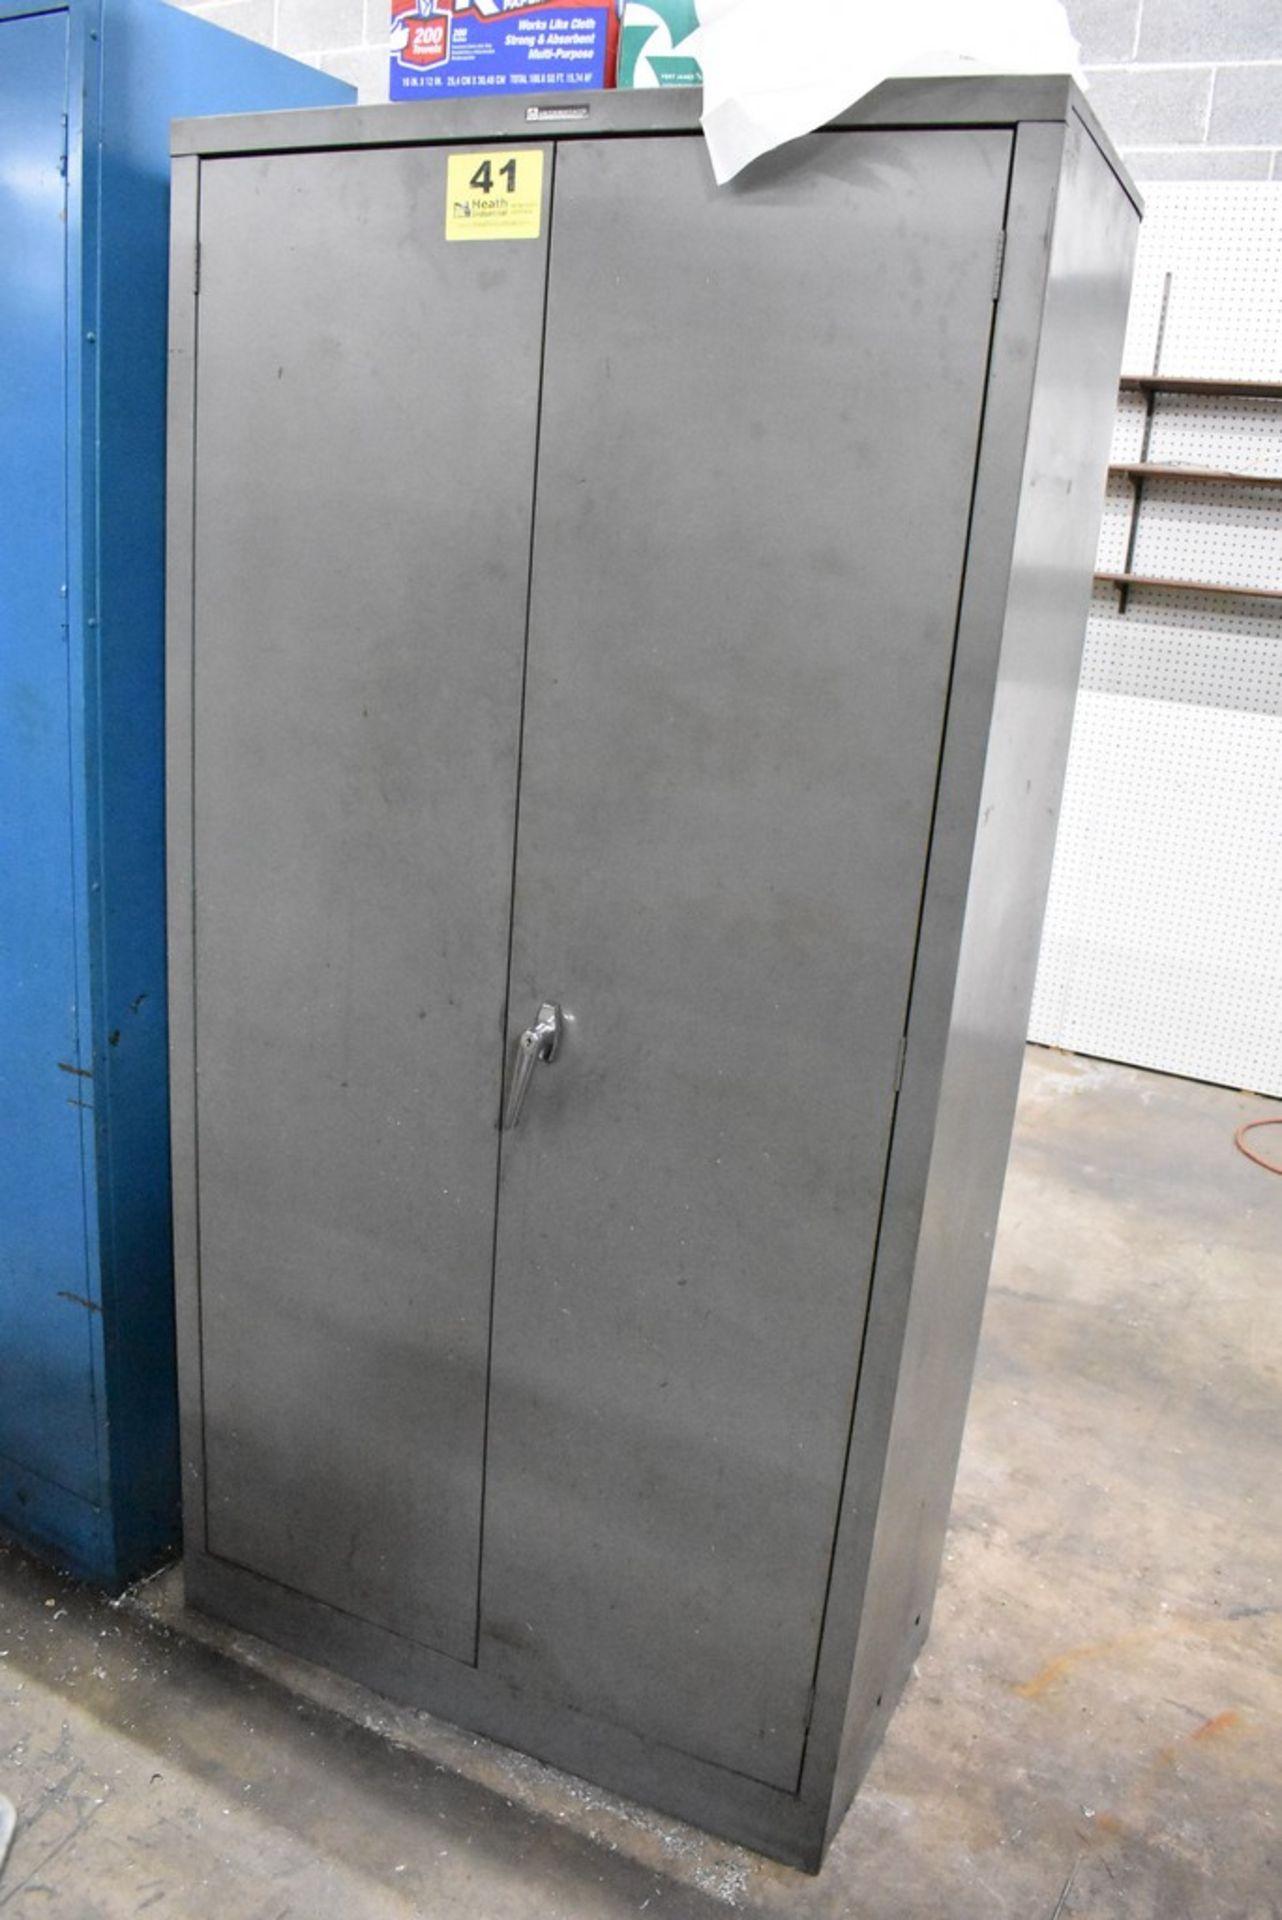 "36"" X 18"" X78"" TWO DOOR STEEL STORAGE CABINET WITH CONTENTS - Image 2 of 4"